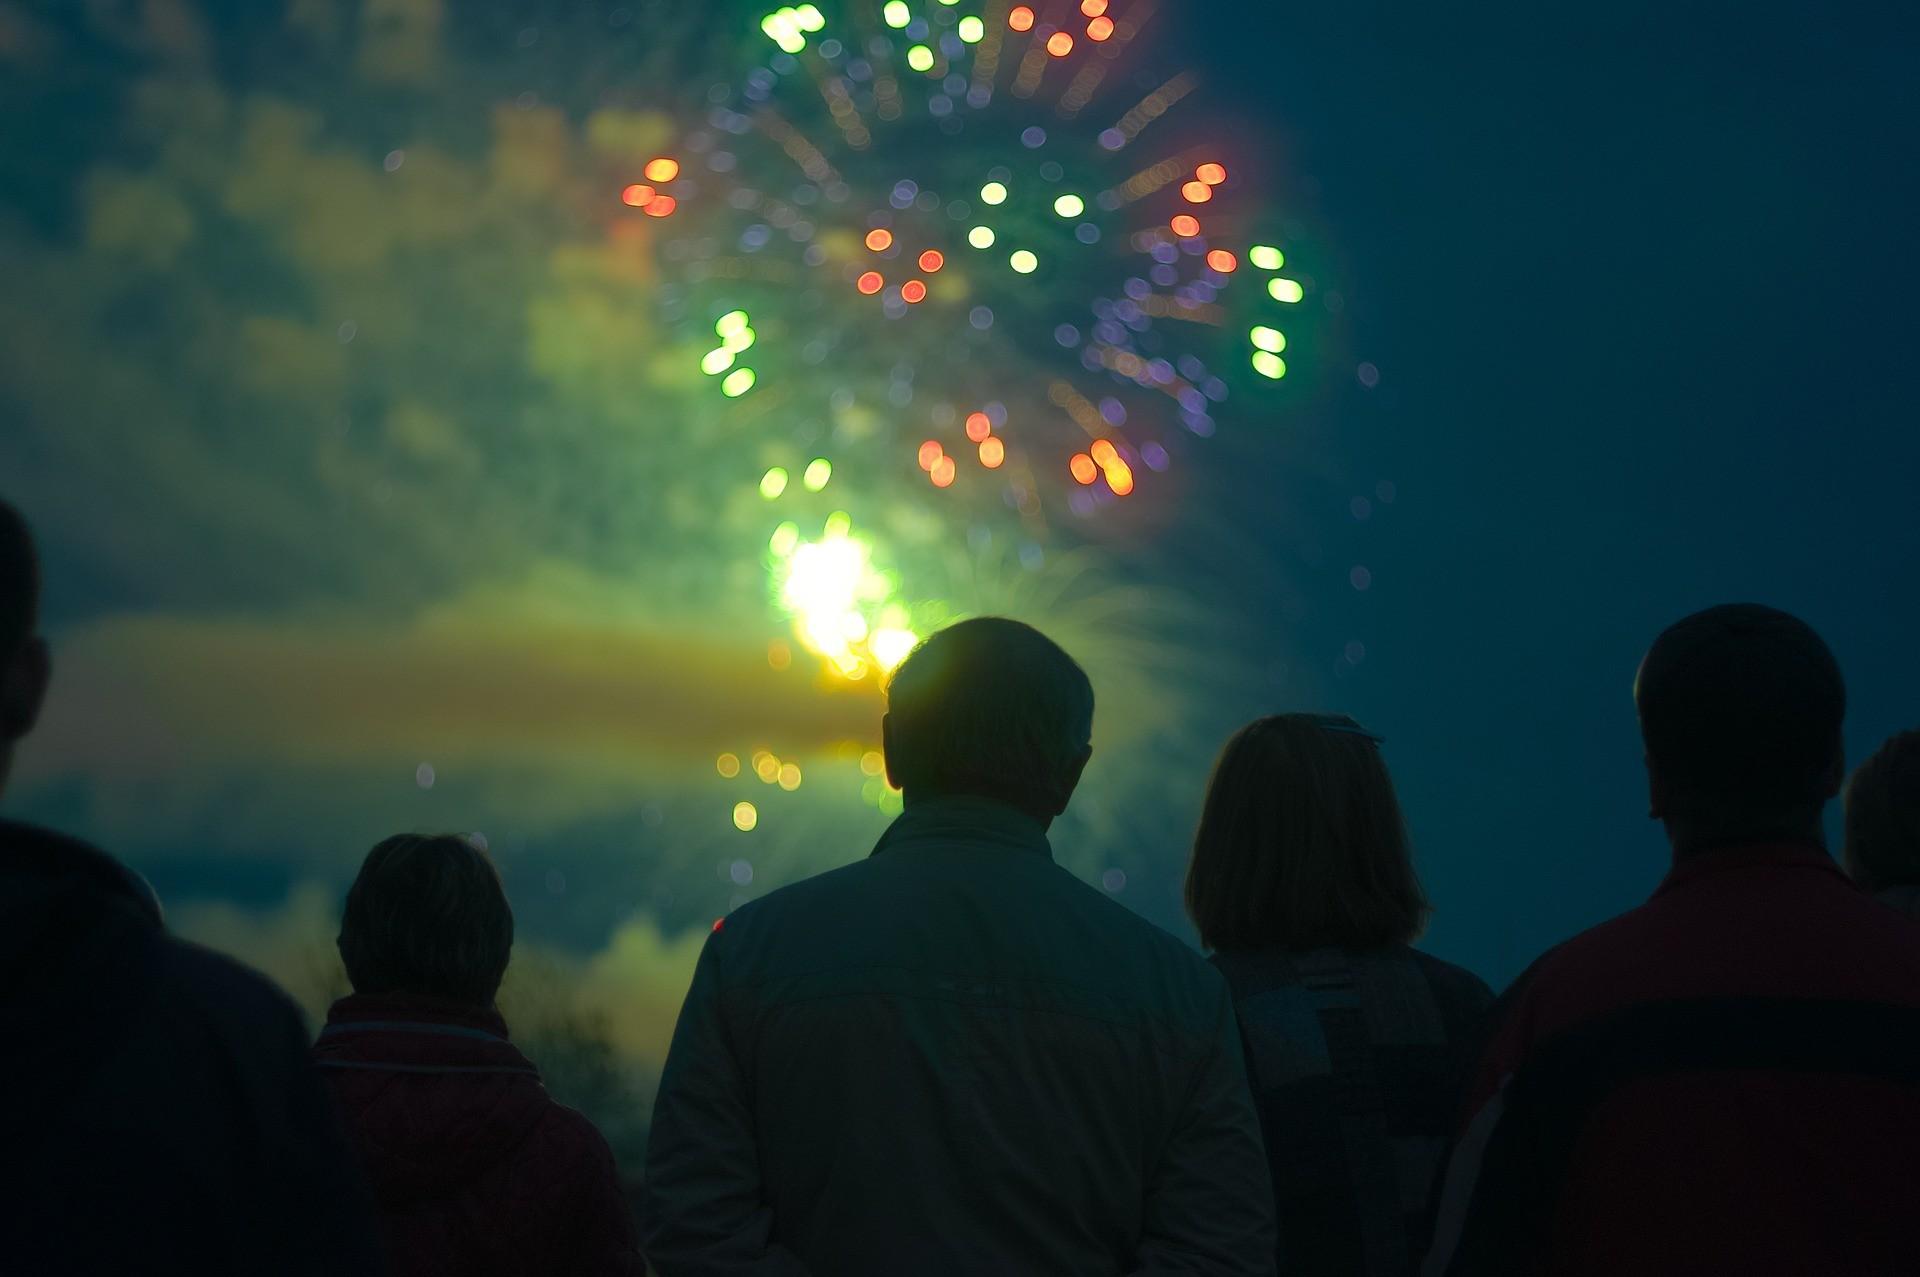 Spectators watch a fireworks display